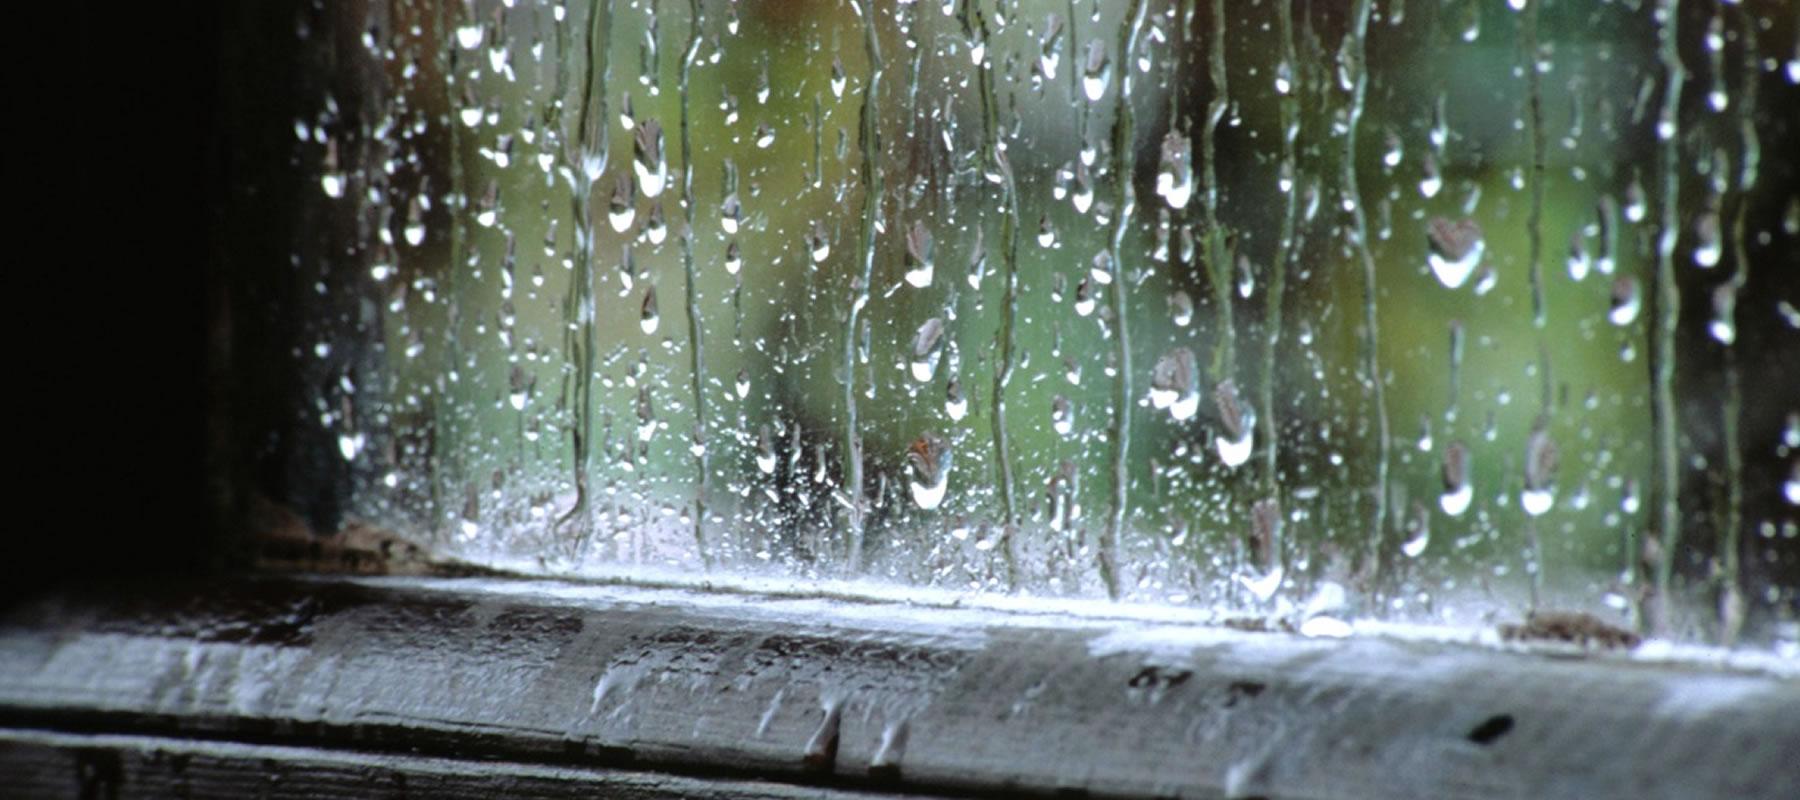 Chove – poema de Jussara N Rezende